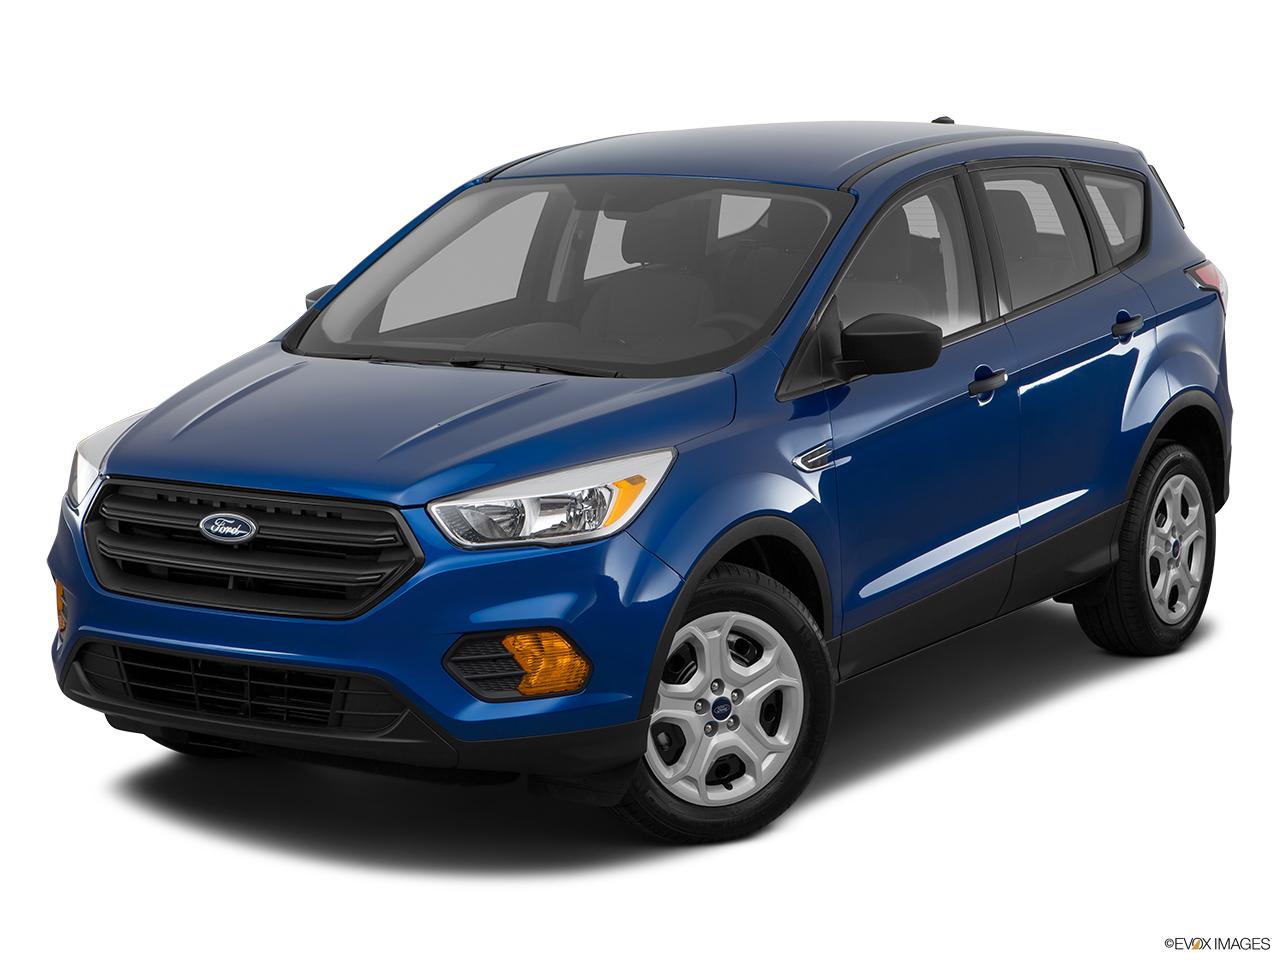 Ford Escape 2017 2 5l S In Bahrain New Car Prices Specs